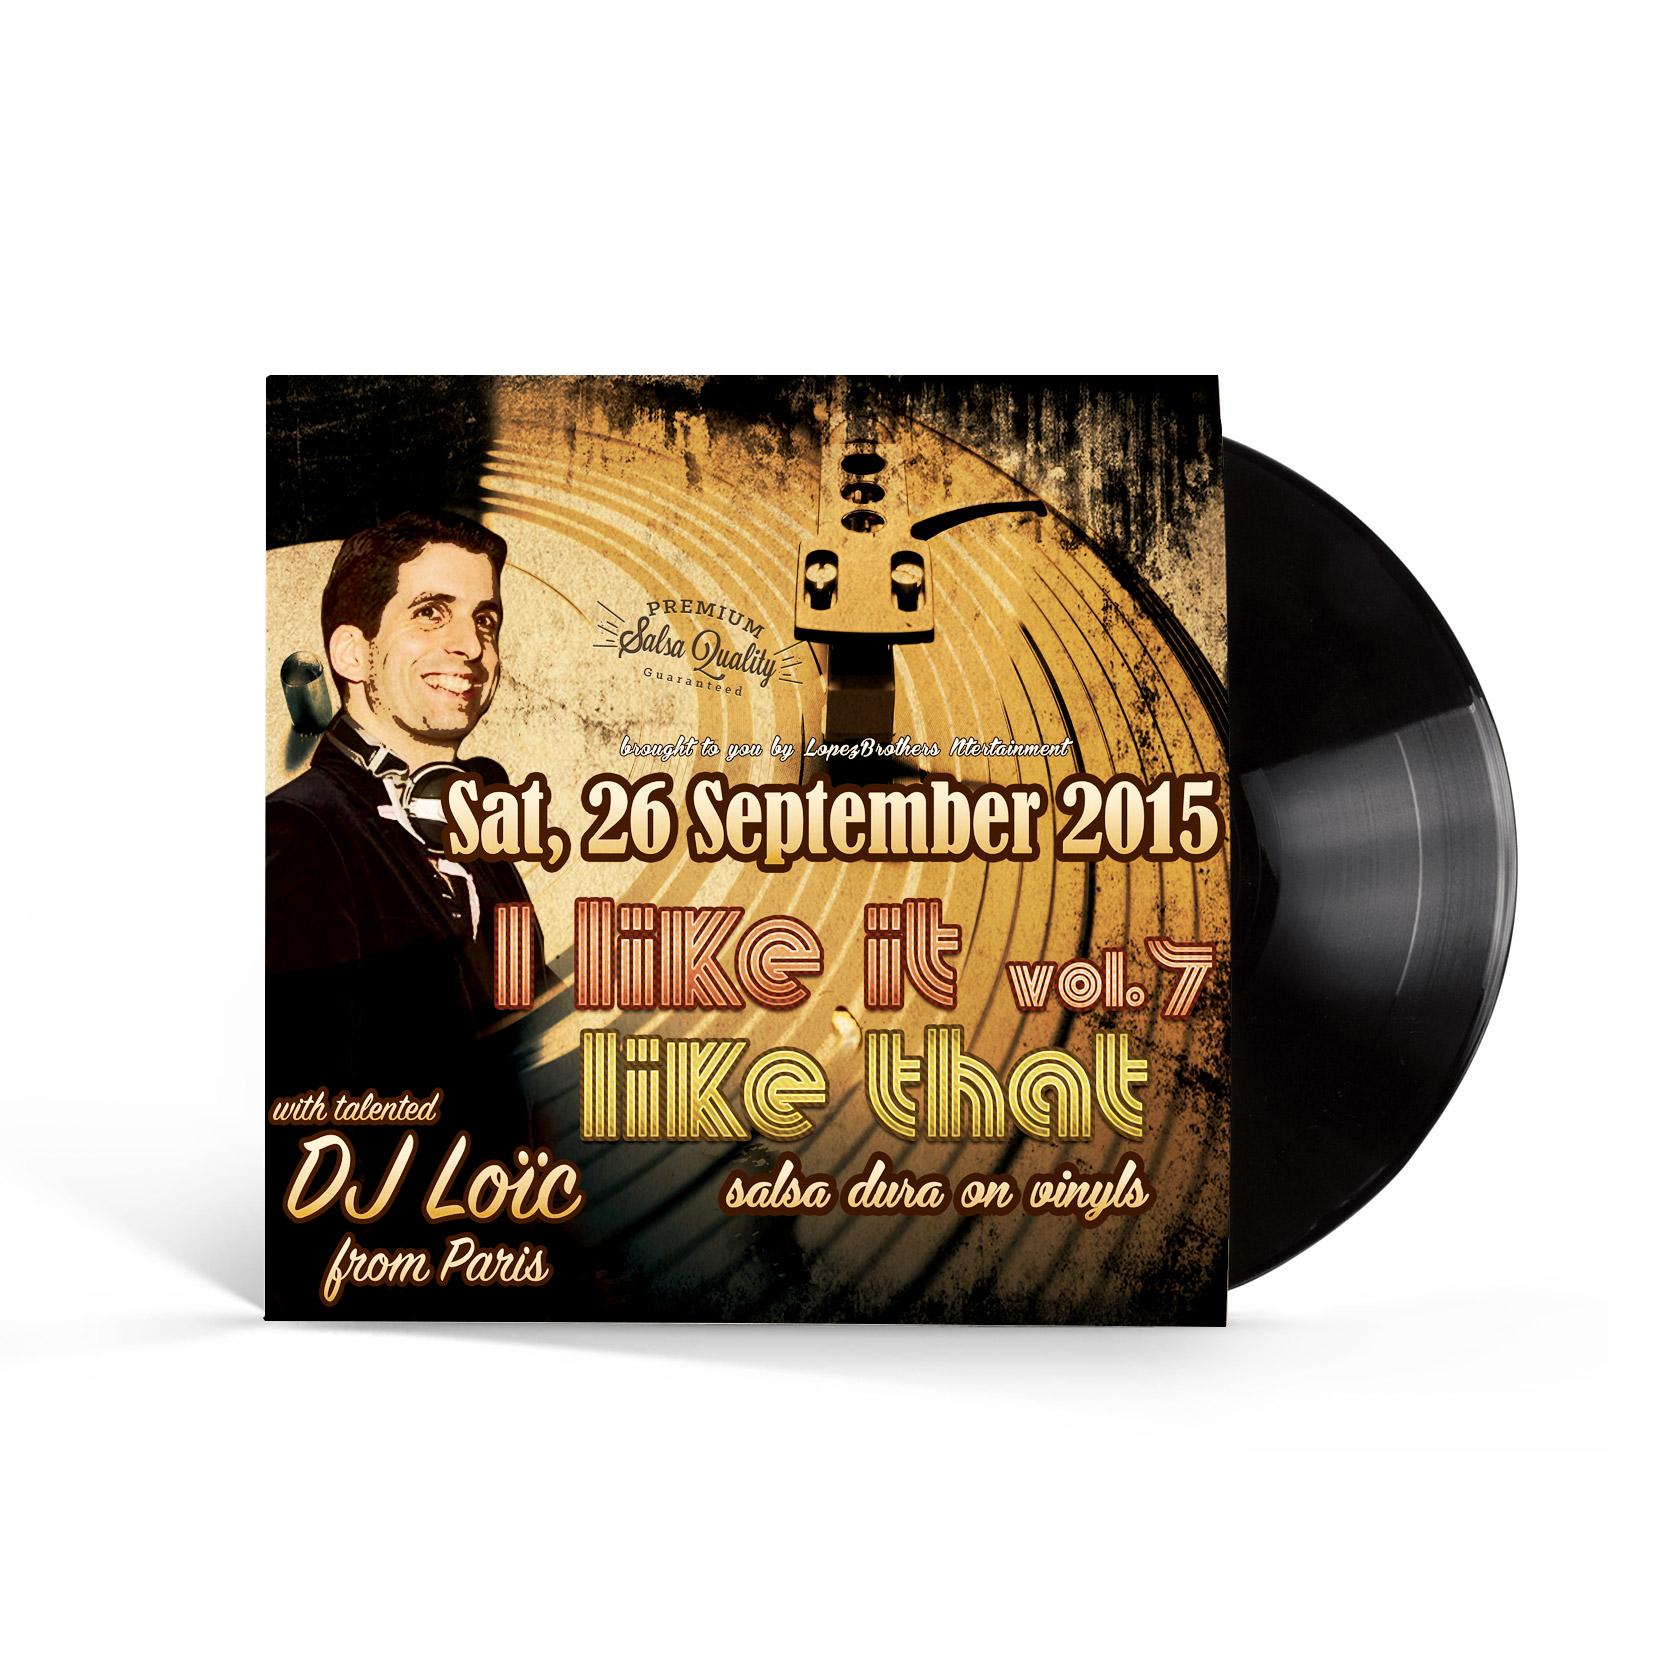 archive-vinyl-party-vol7.jpg